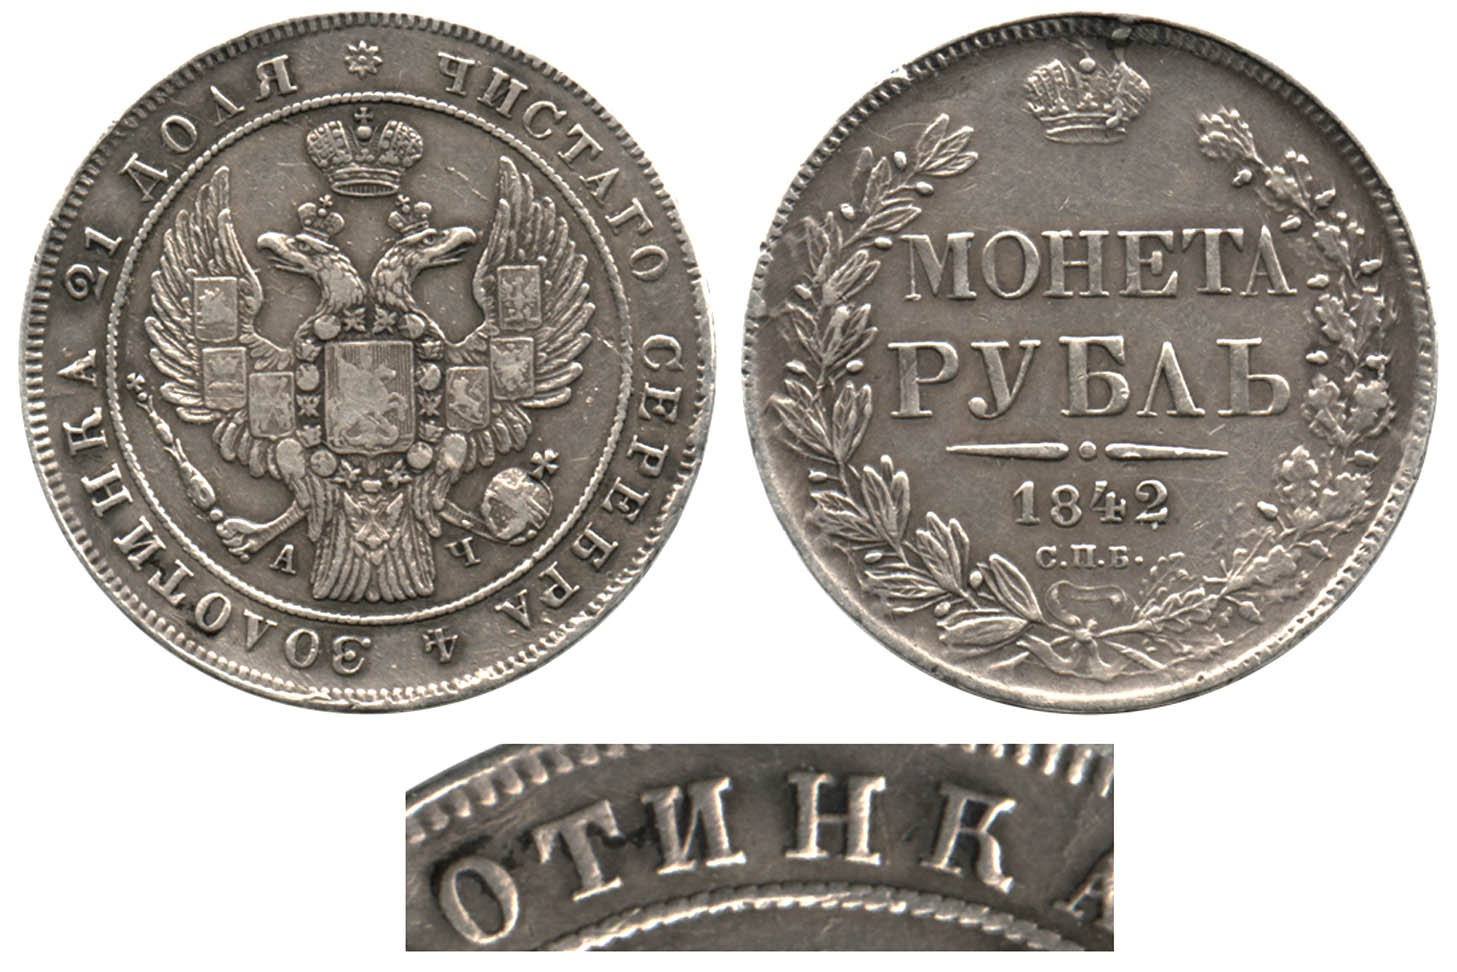 Рубль 1842 СПБ-АЧ IIa-Е №1 ЗОЛОТИНКА.jpg